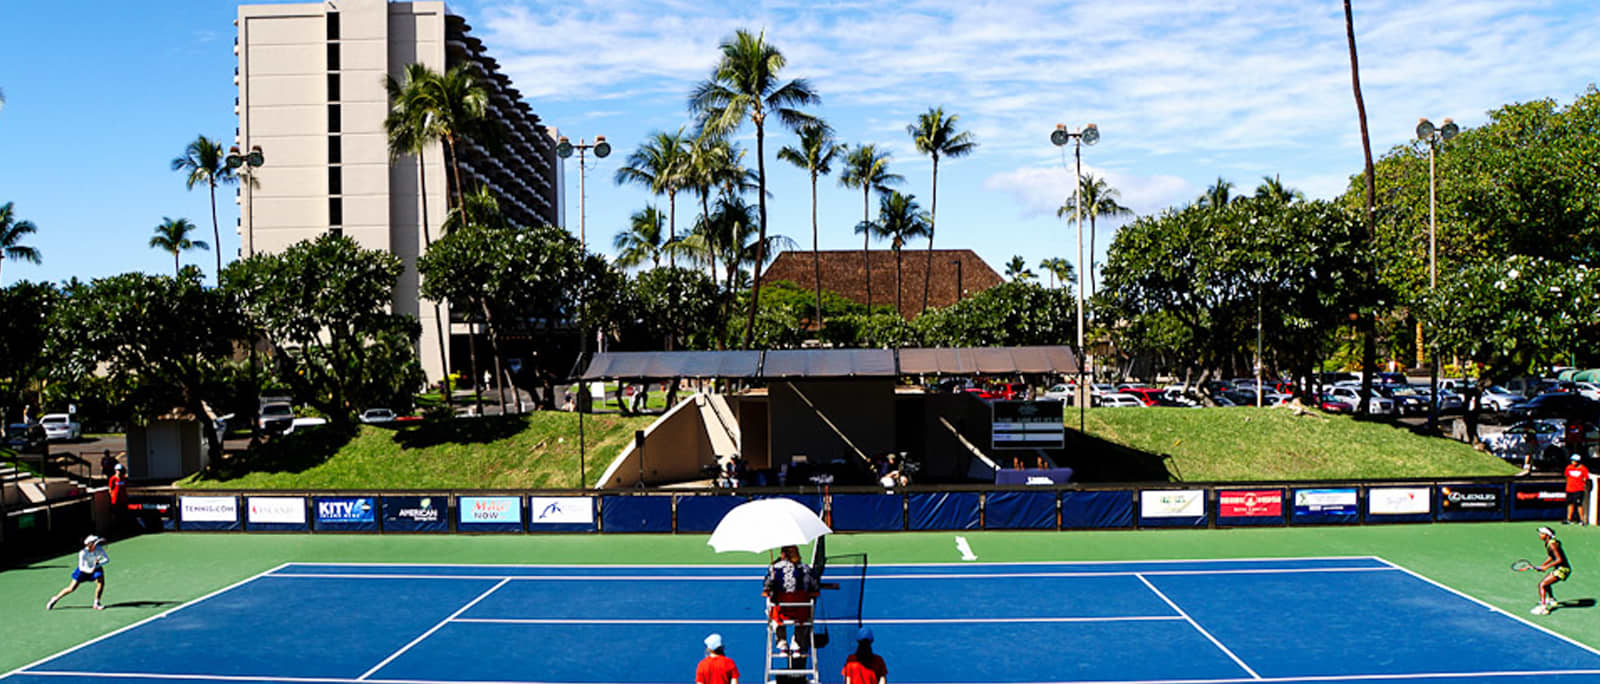 Amenities of Royal Lahaina Resort, Hawaii